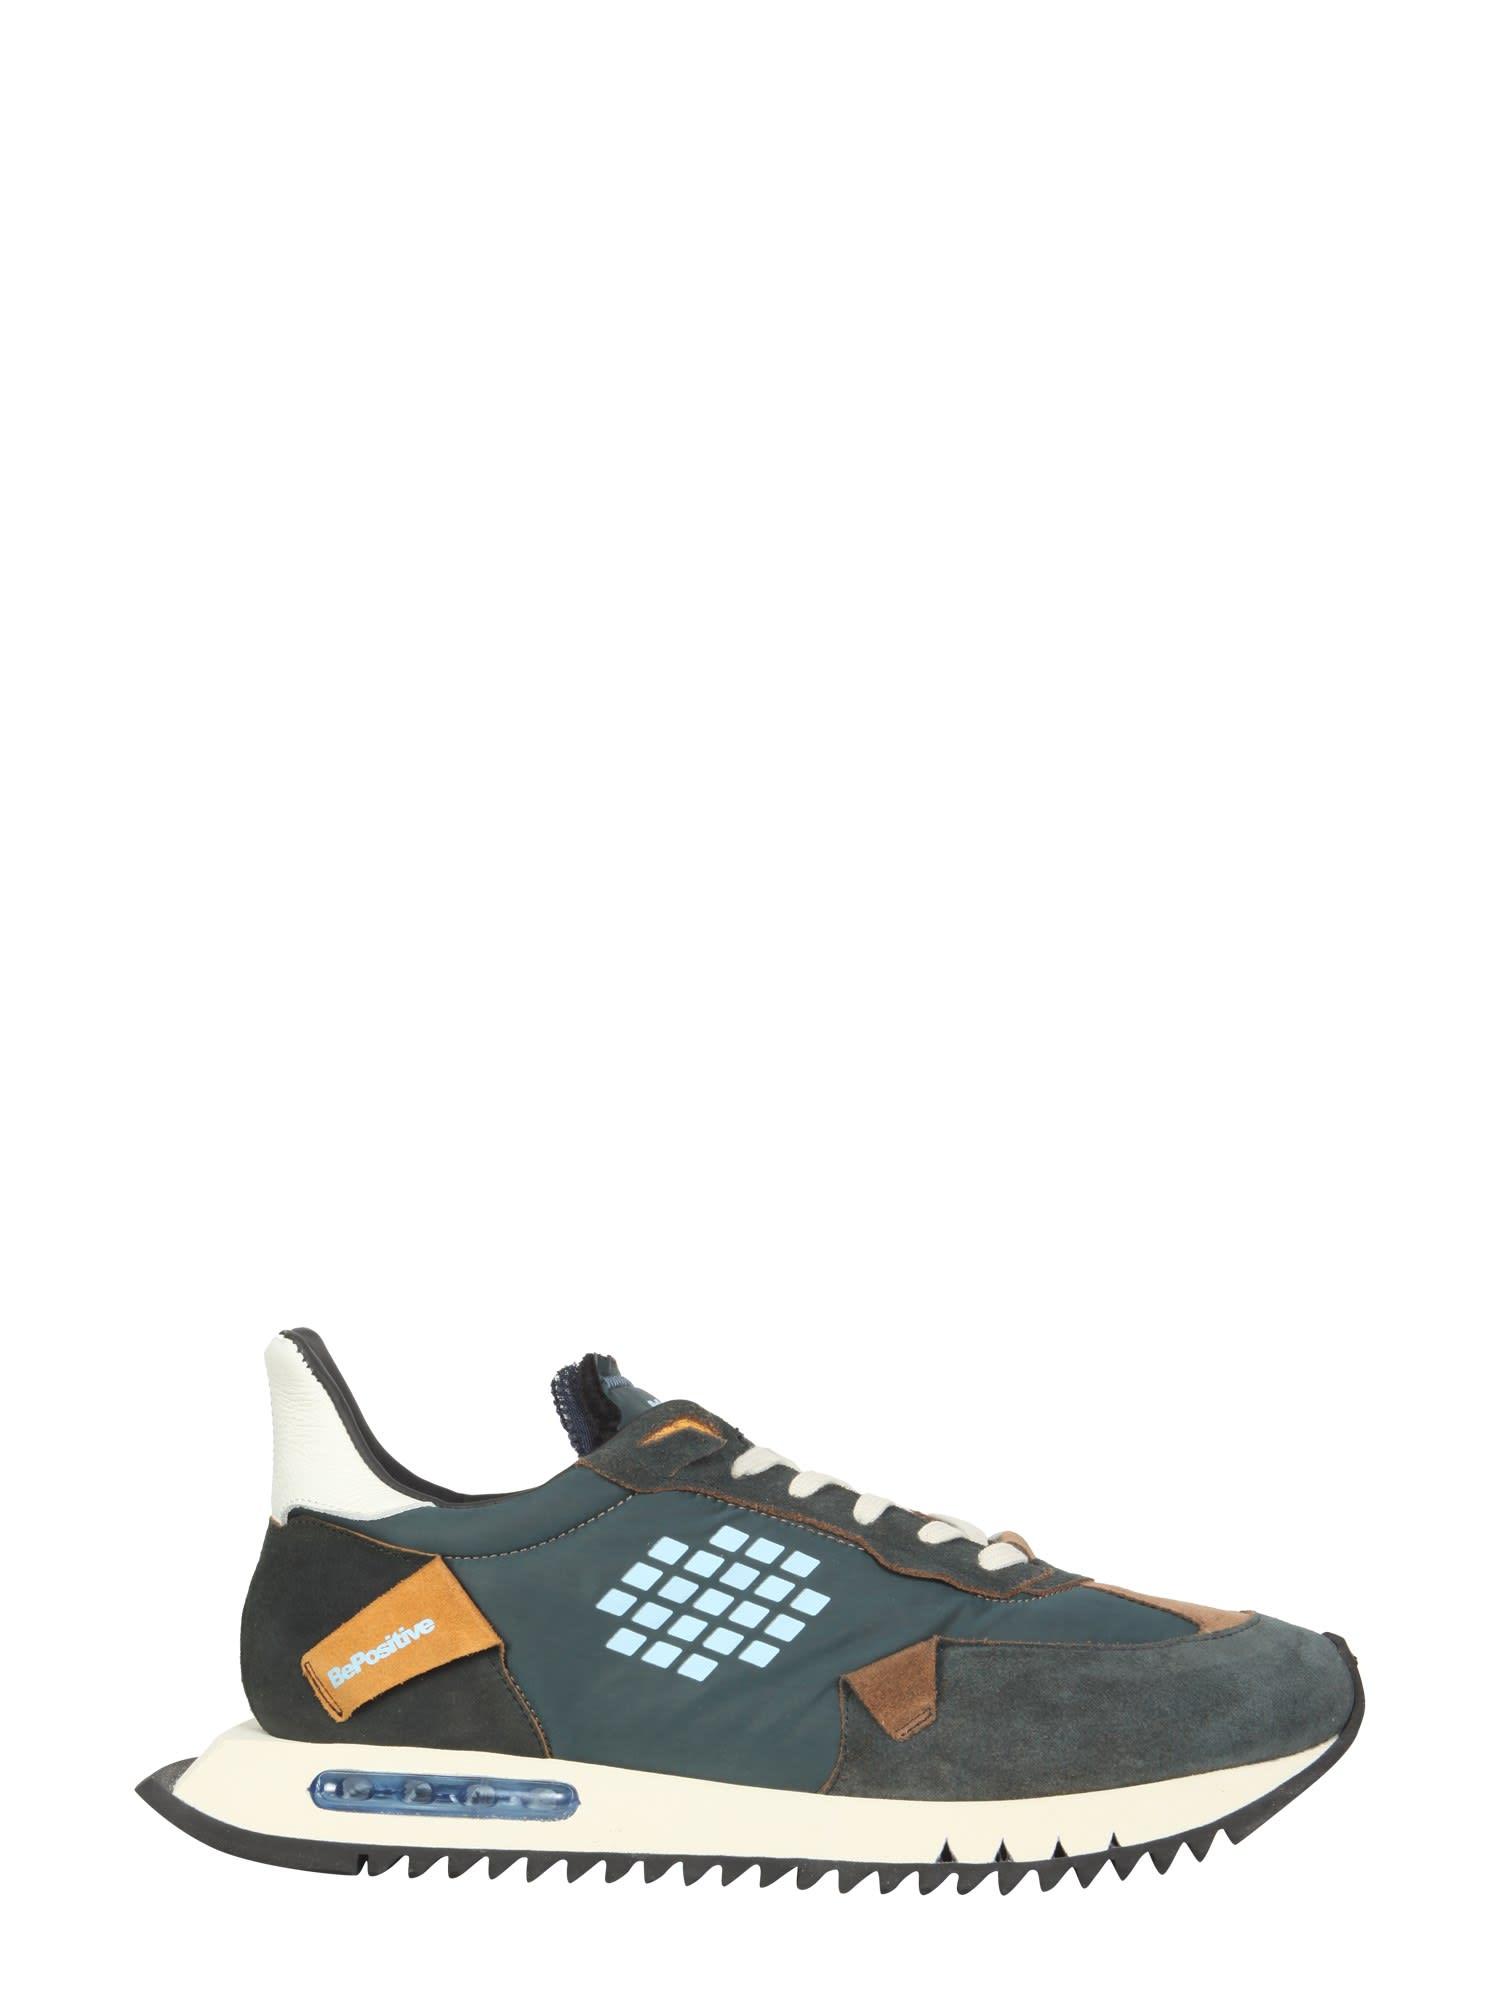 Space Run Sneakers